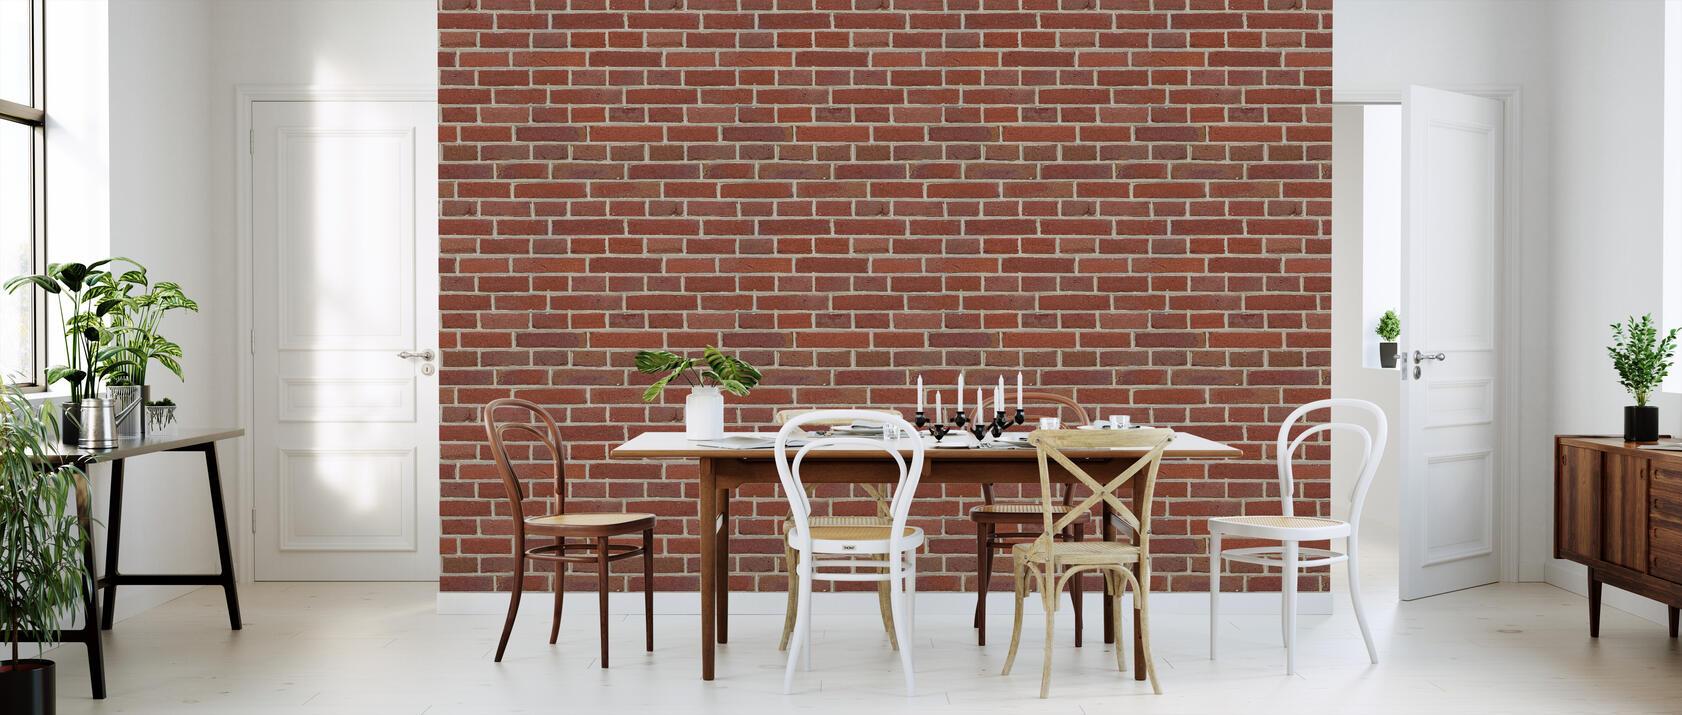 red brick wall einzigartige tapete h chster qualit t. Black Bedroom Furniture Sets. Home Design Ideas